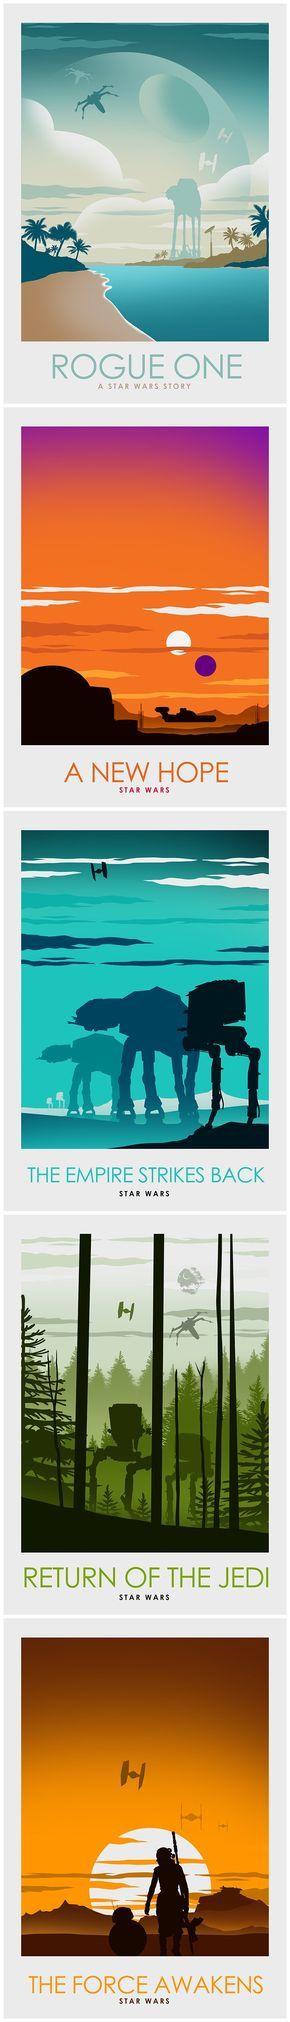 Star Wars Minimalist Poster Series - Created by Ciaran Monaghan